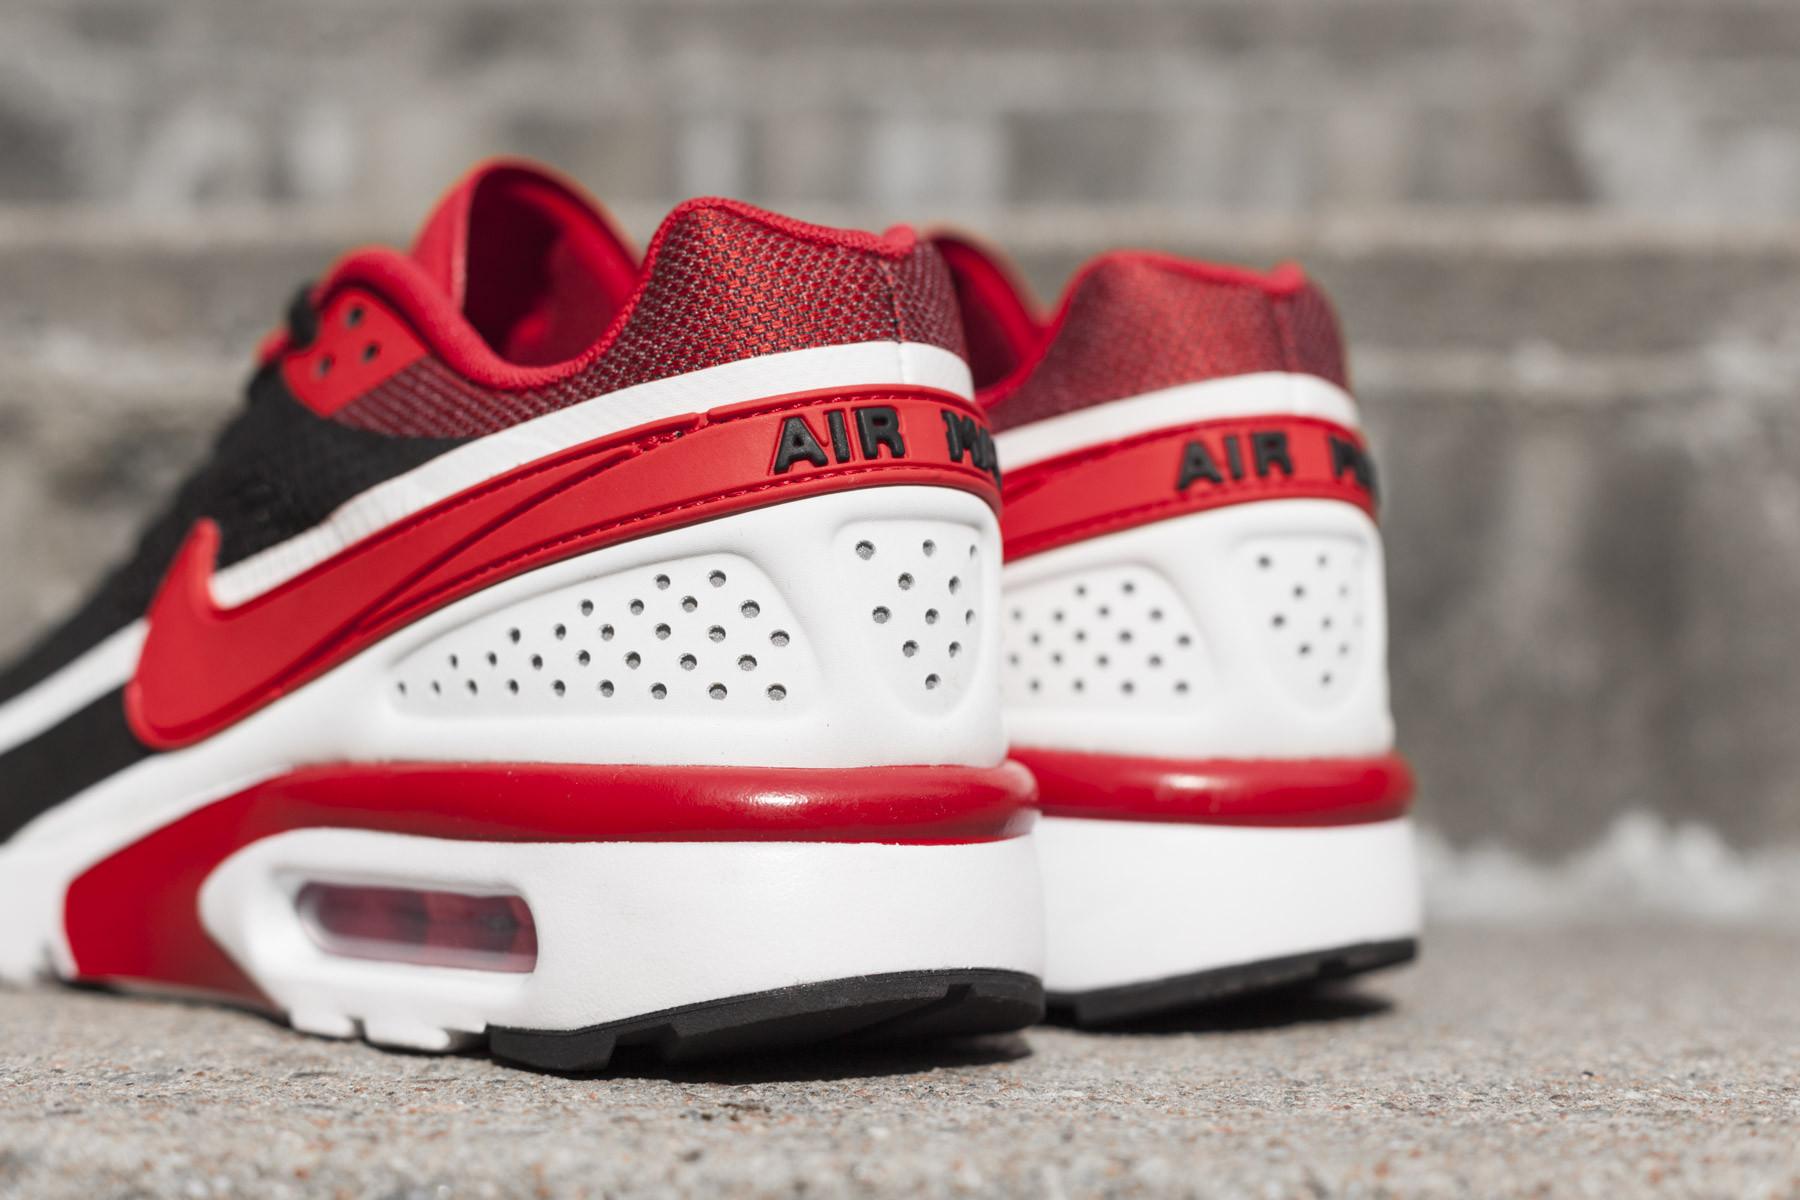 Nike Air Max BW Ultra SE Black Red White 844967 006